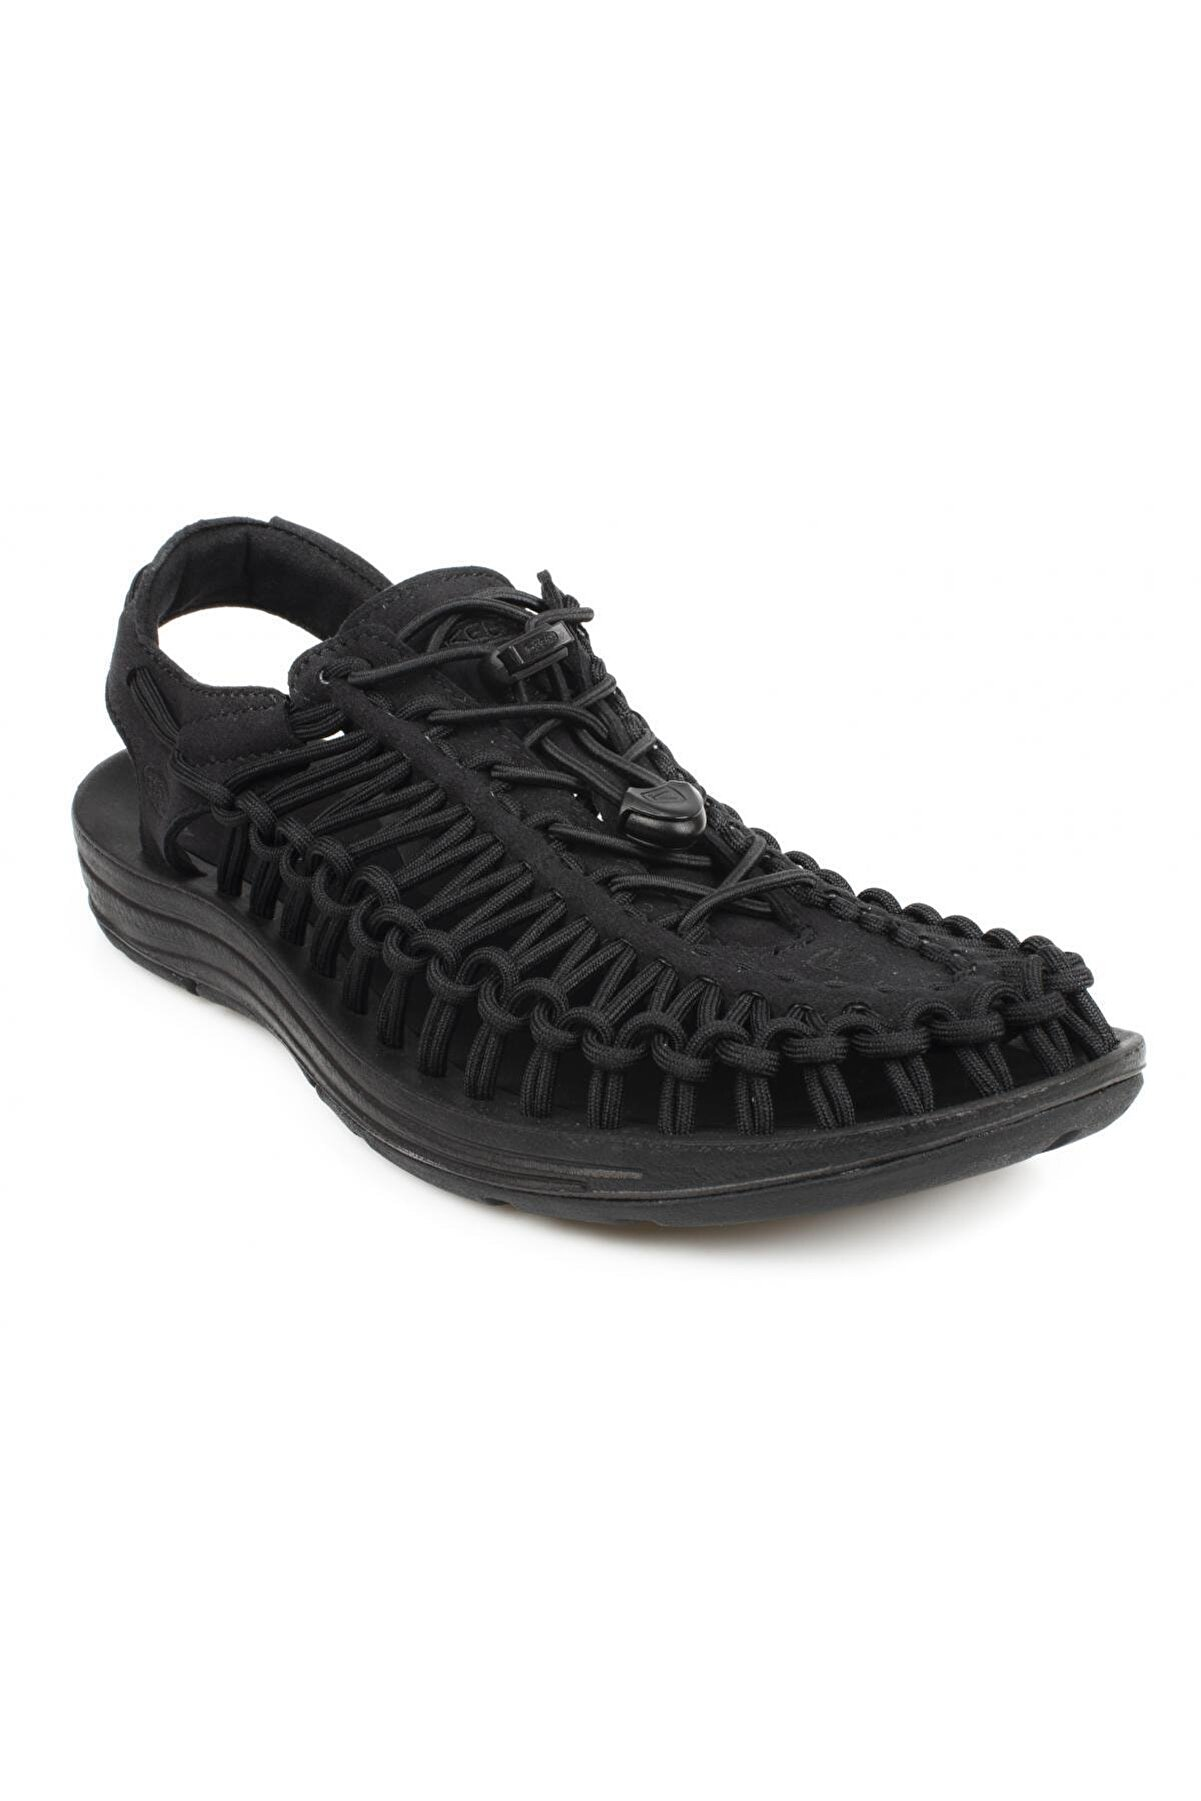 Keen Erkek  Siyah Sandalet